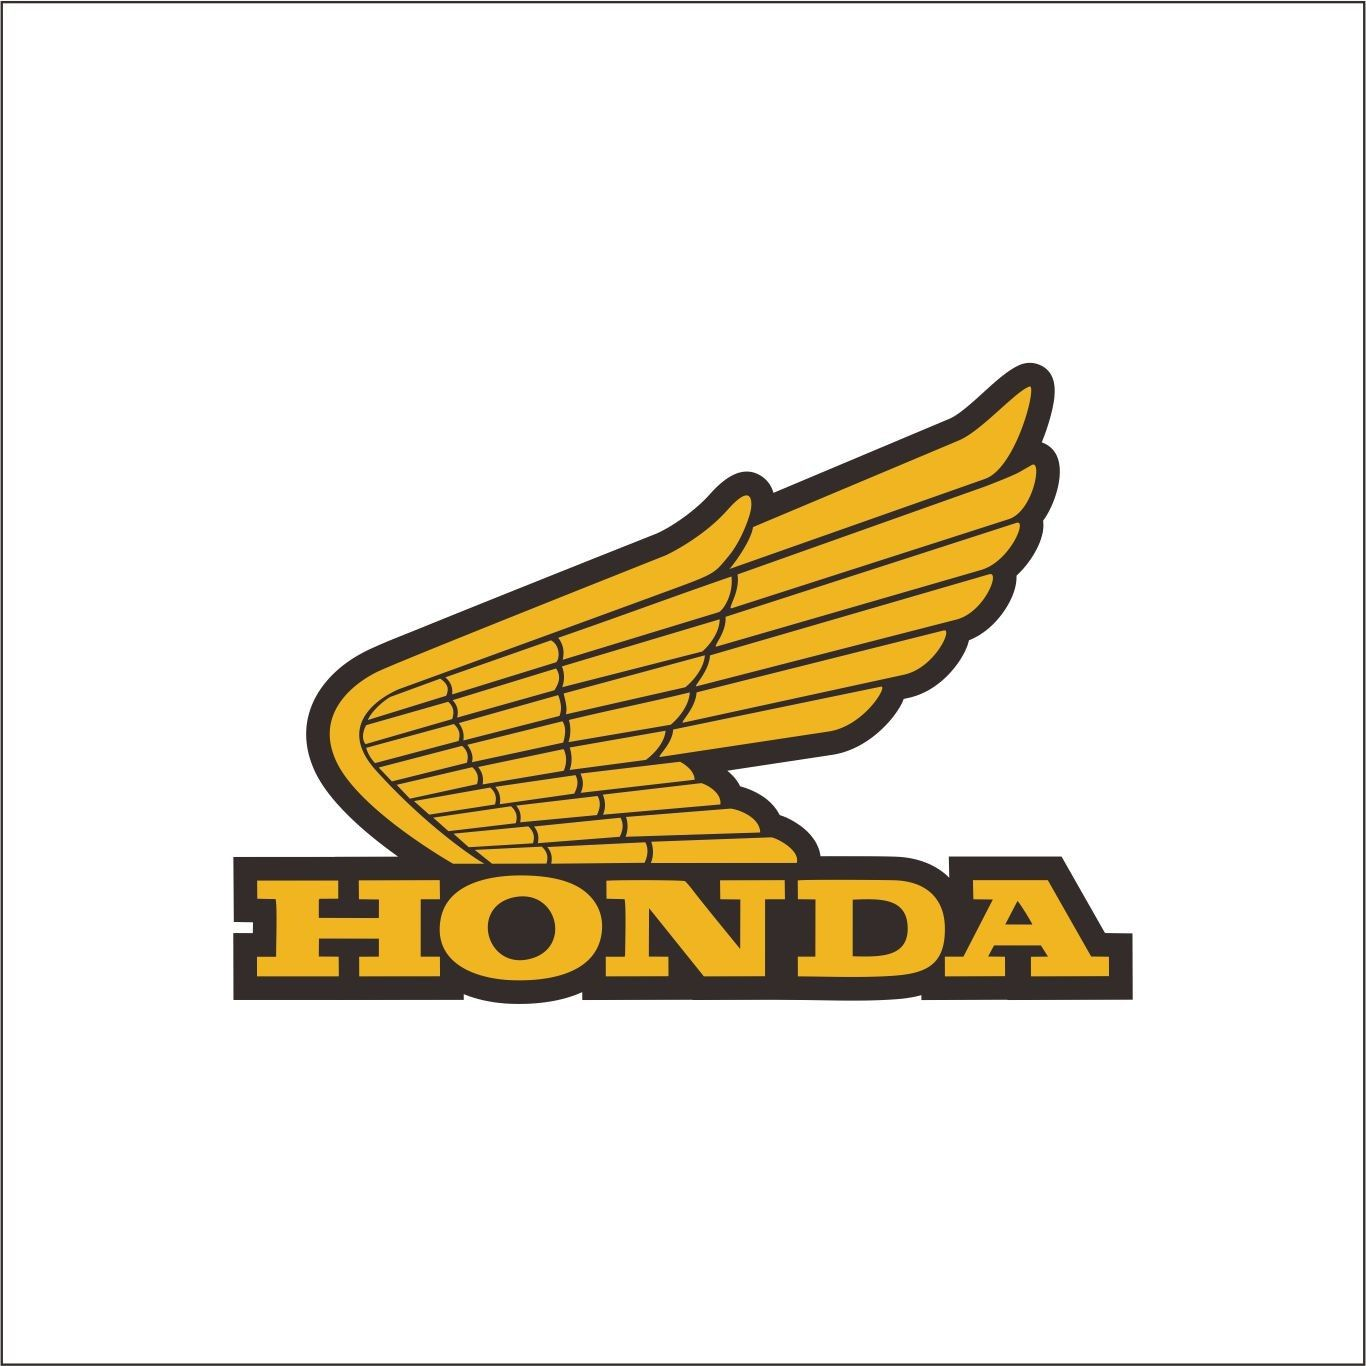 Honda Clasic Logos Pinterest Dan Produk Ukm Bumn Rc Super Power Truck Type 2